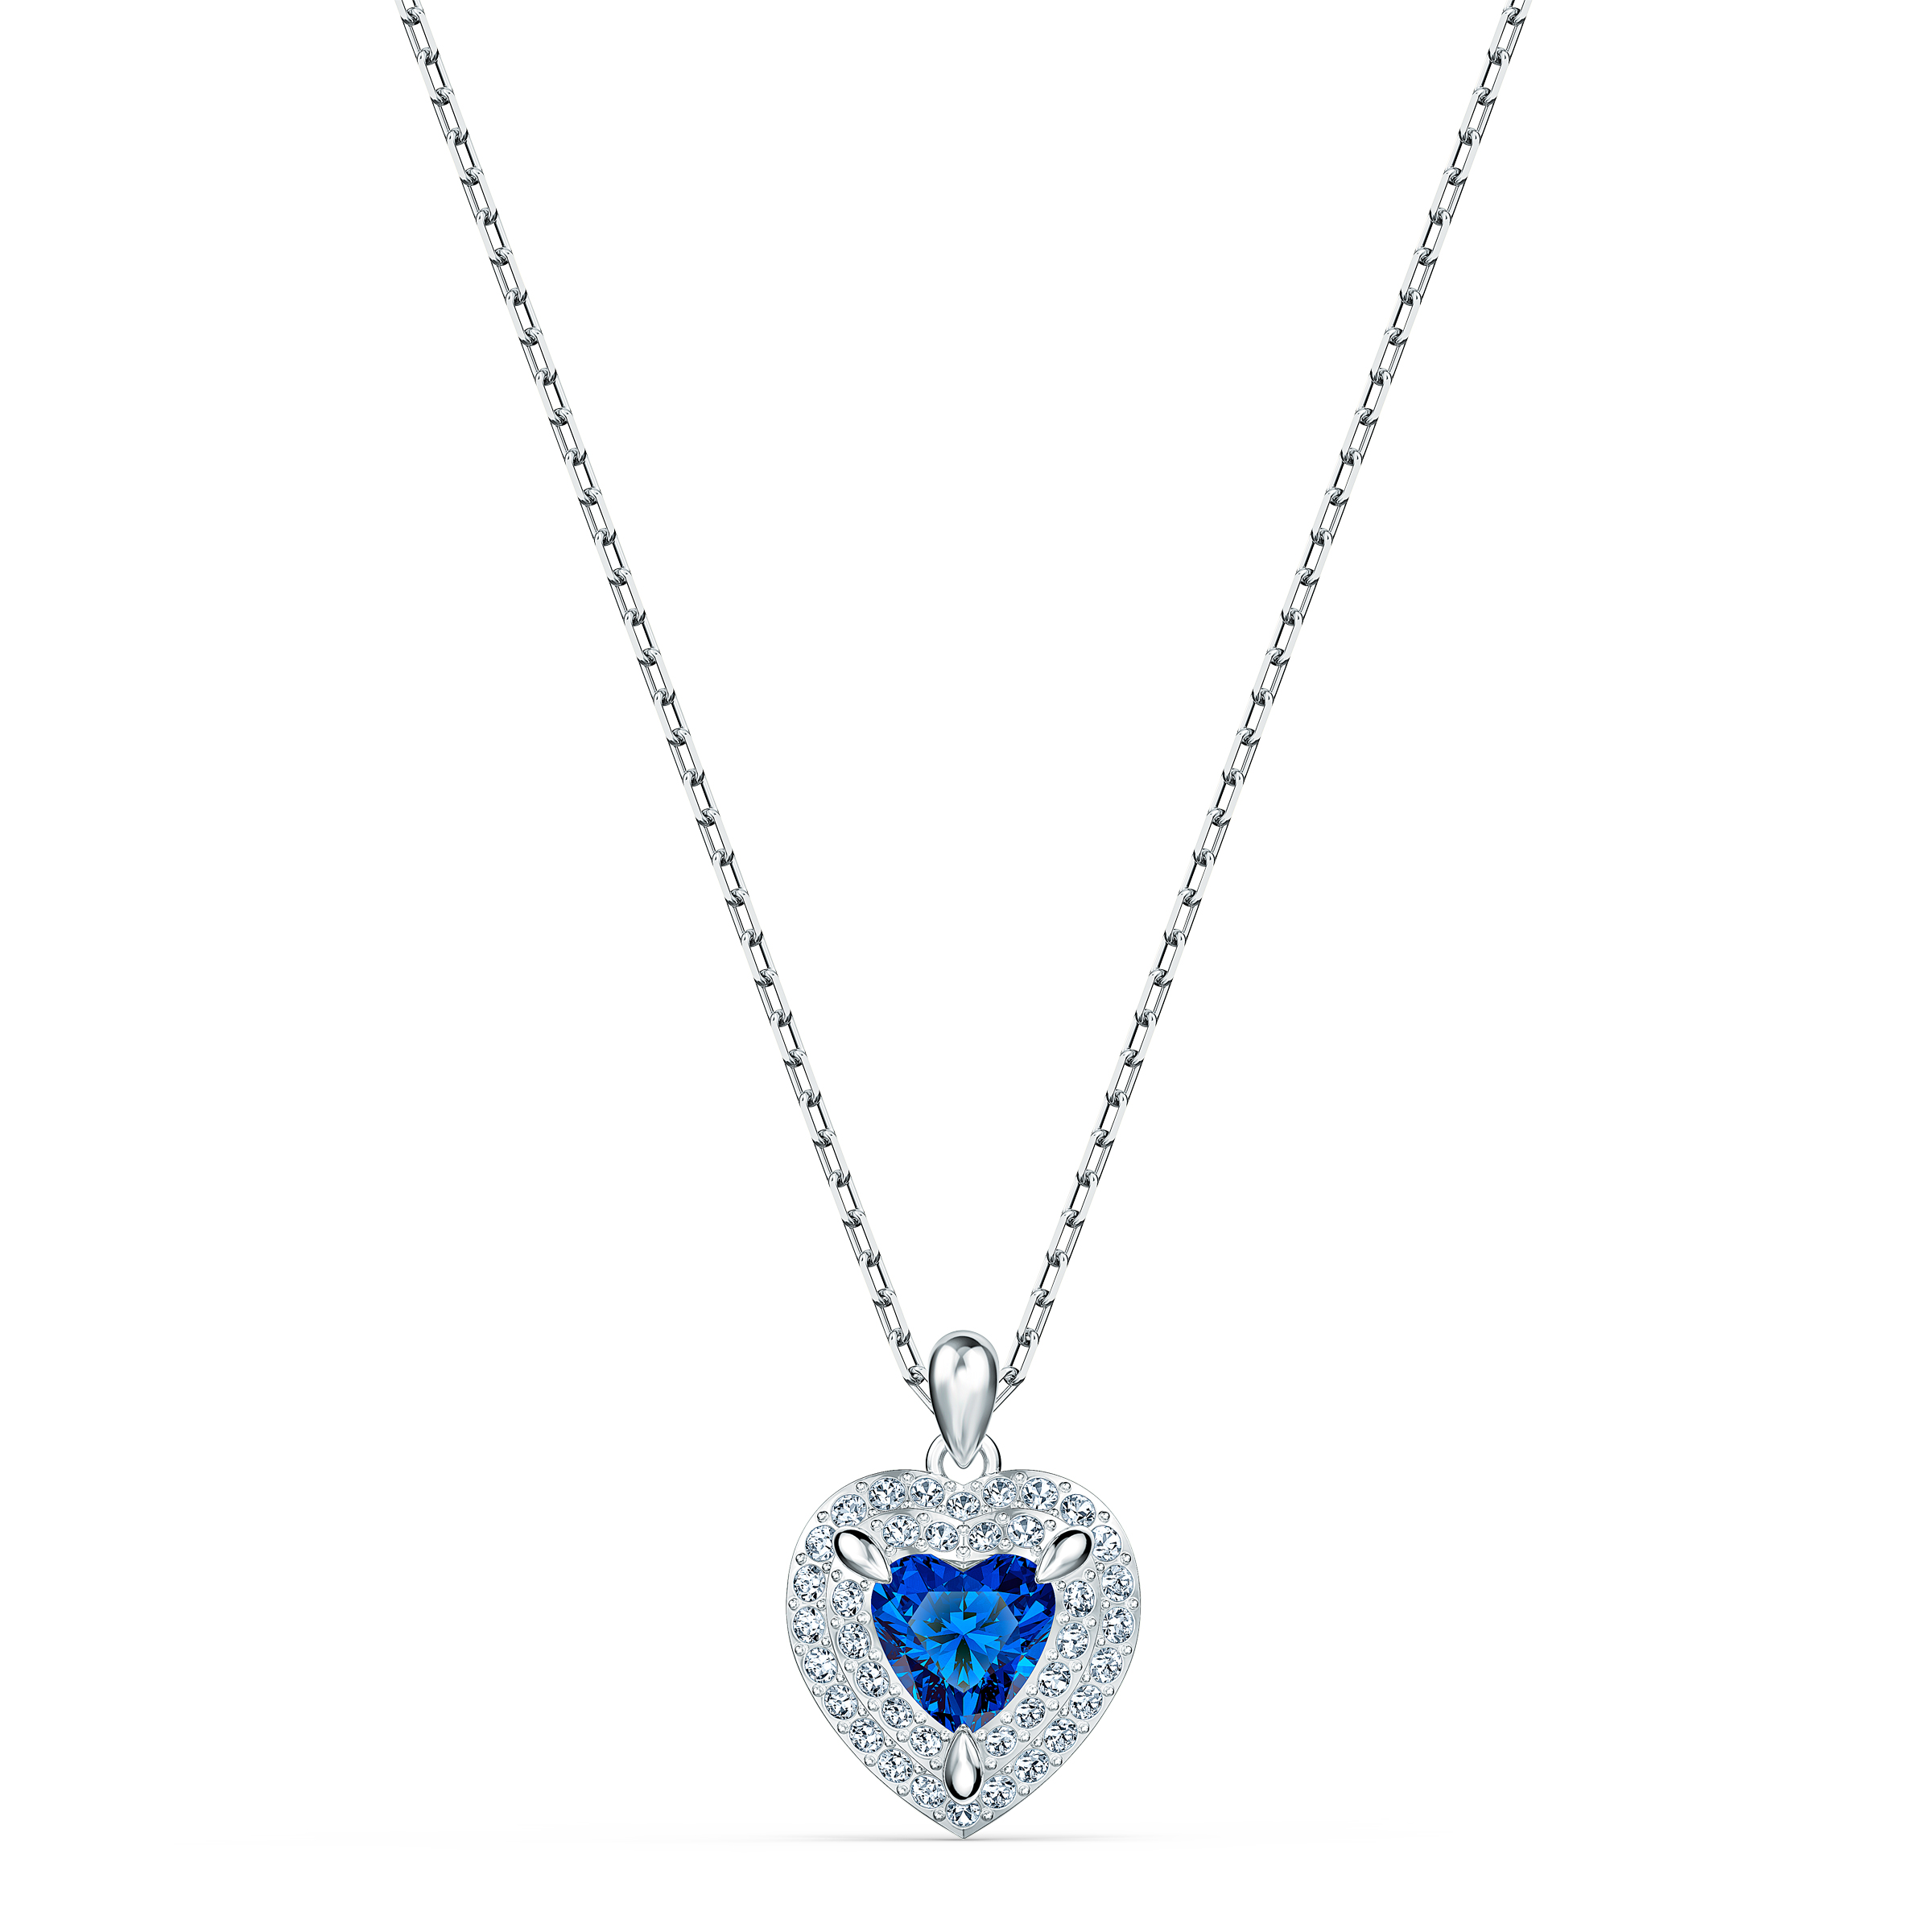 Pendentif One, bleu, métal rhodié, Swarovski